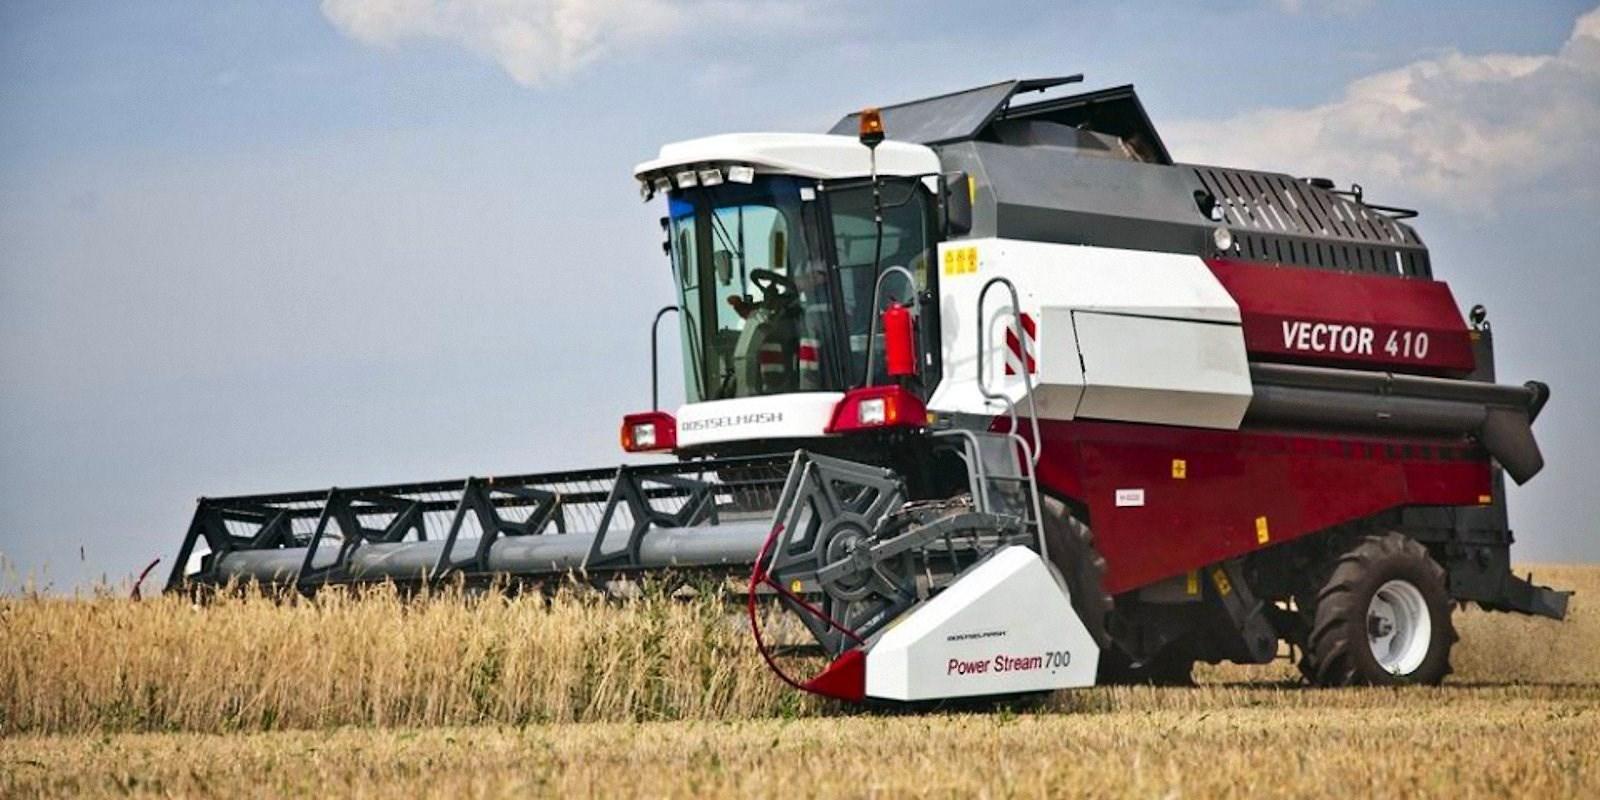 00 harvester combine russia 050915